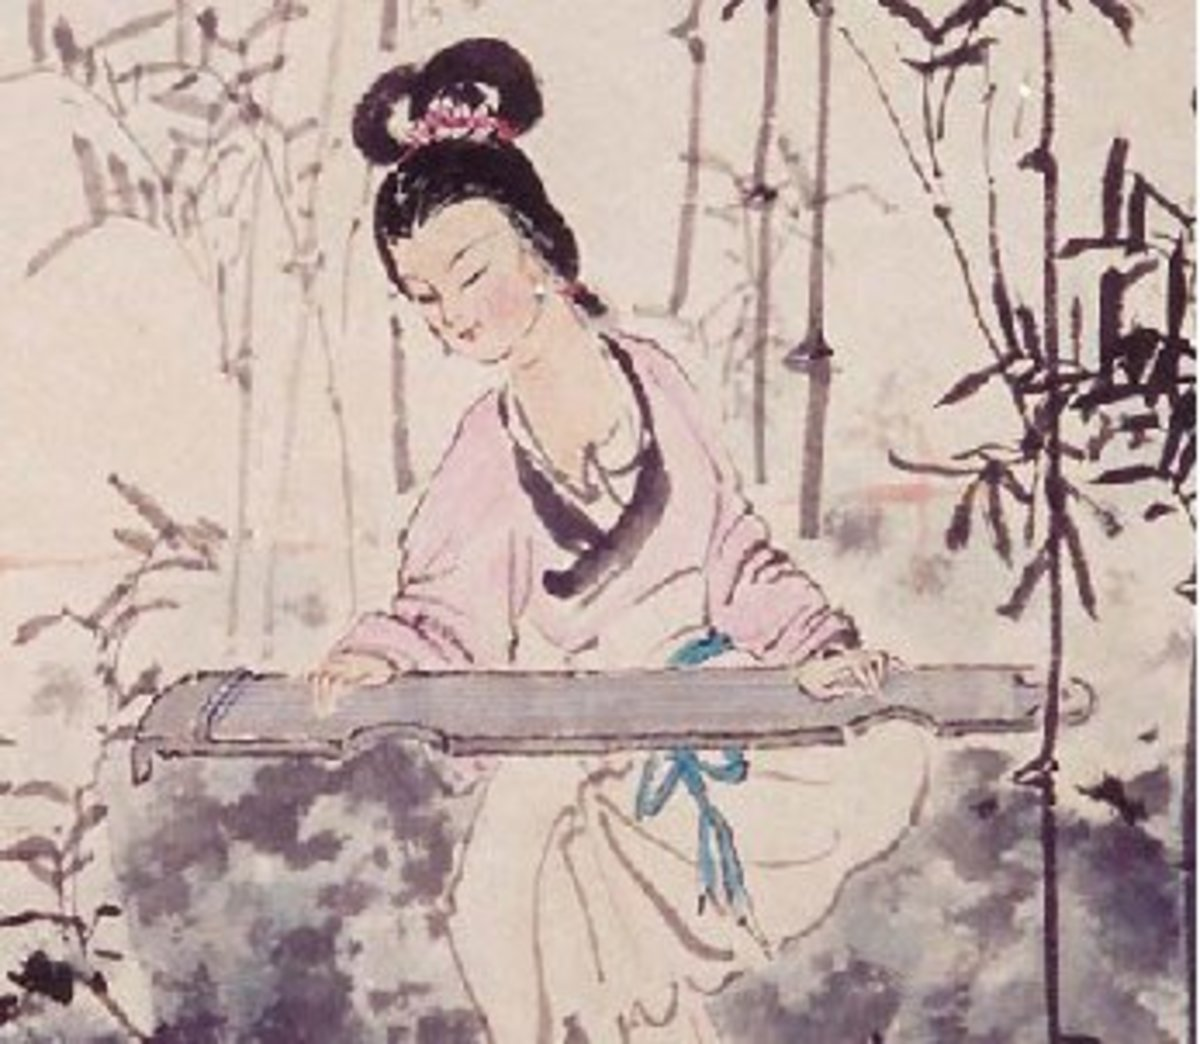 worlds-oldest-musical-instruments